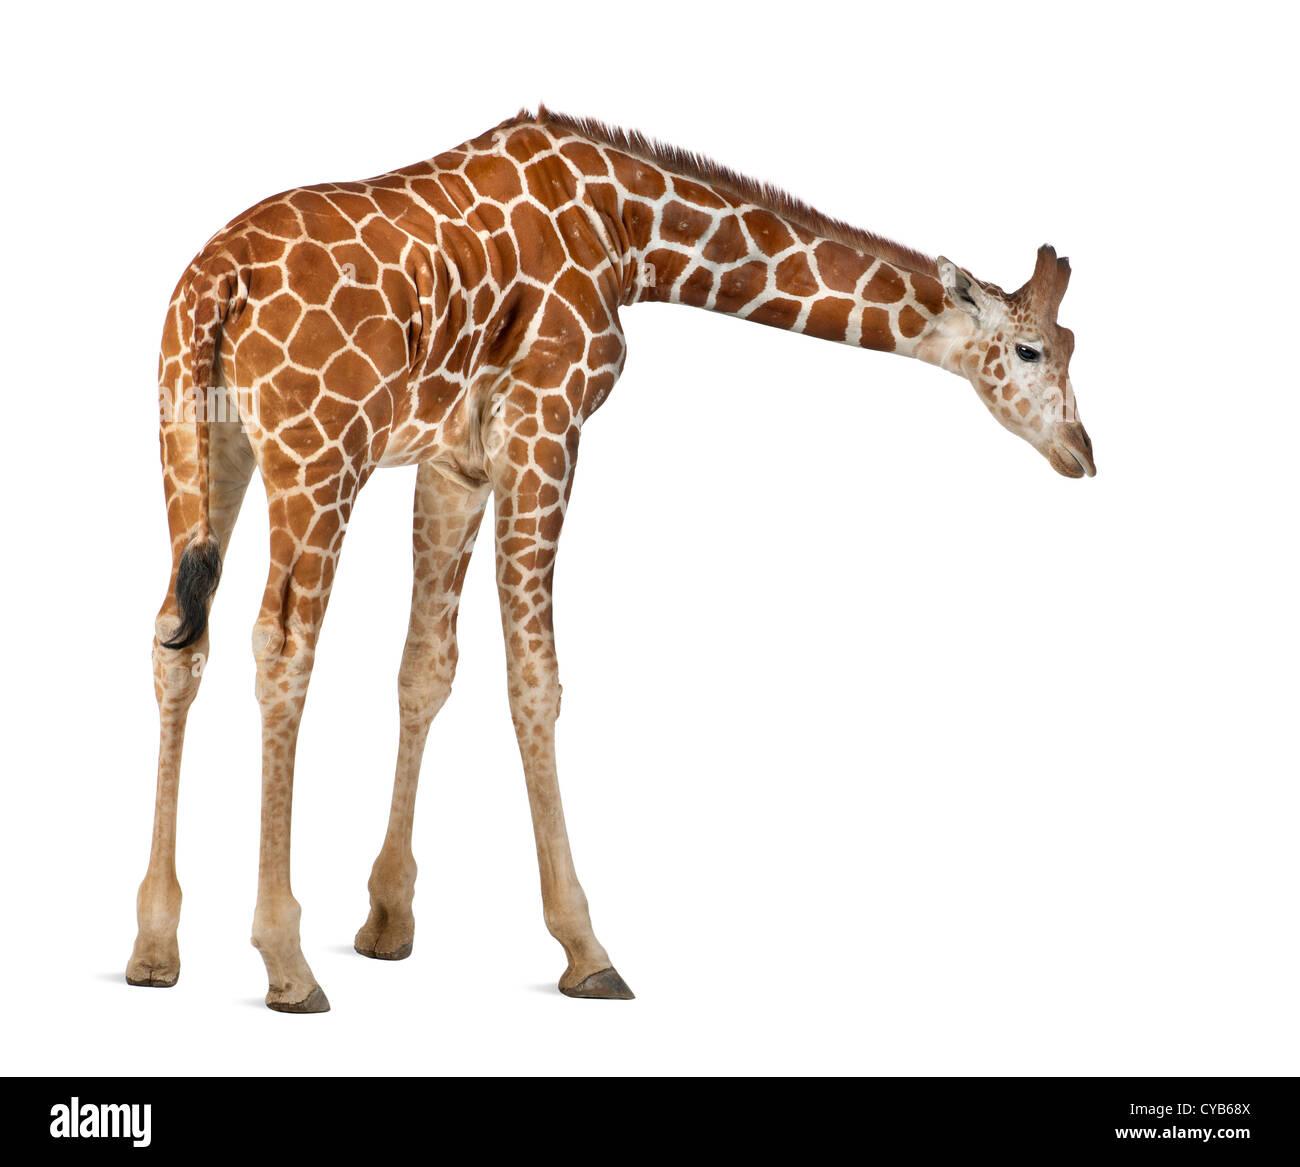 Somali Giraffe, known as Reticulated Giraffe, Giraffa camelopardalis reticulata, 2.5 years old, against white background Stock Photo